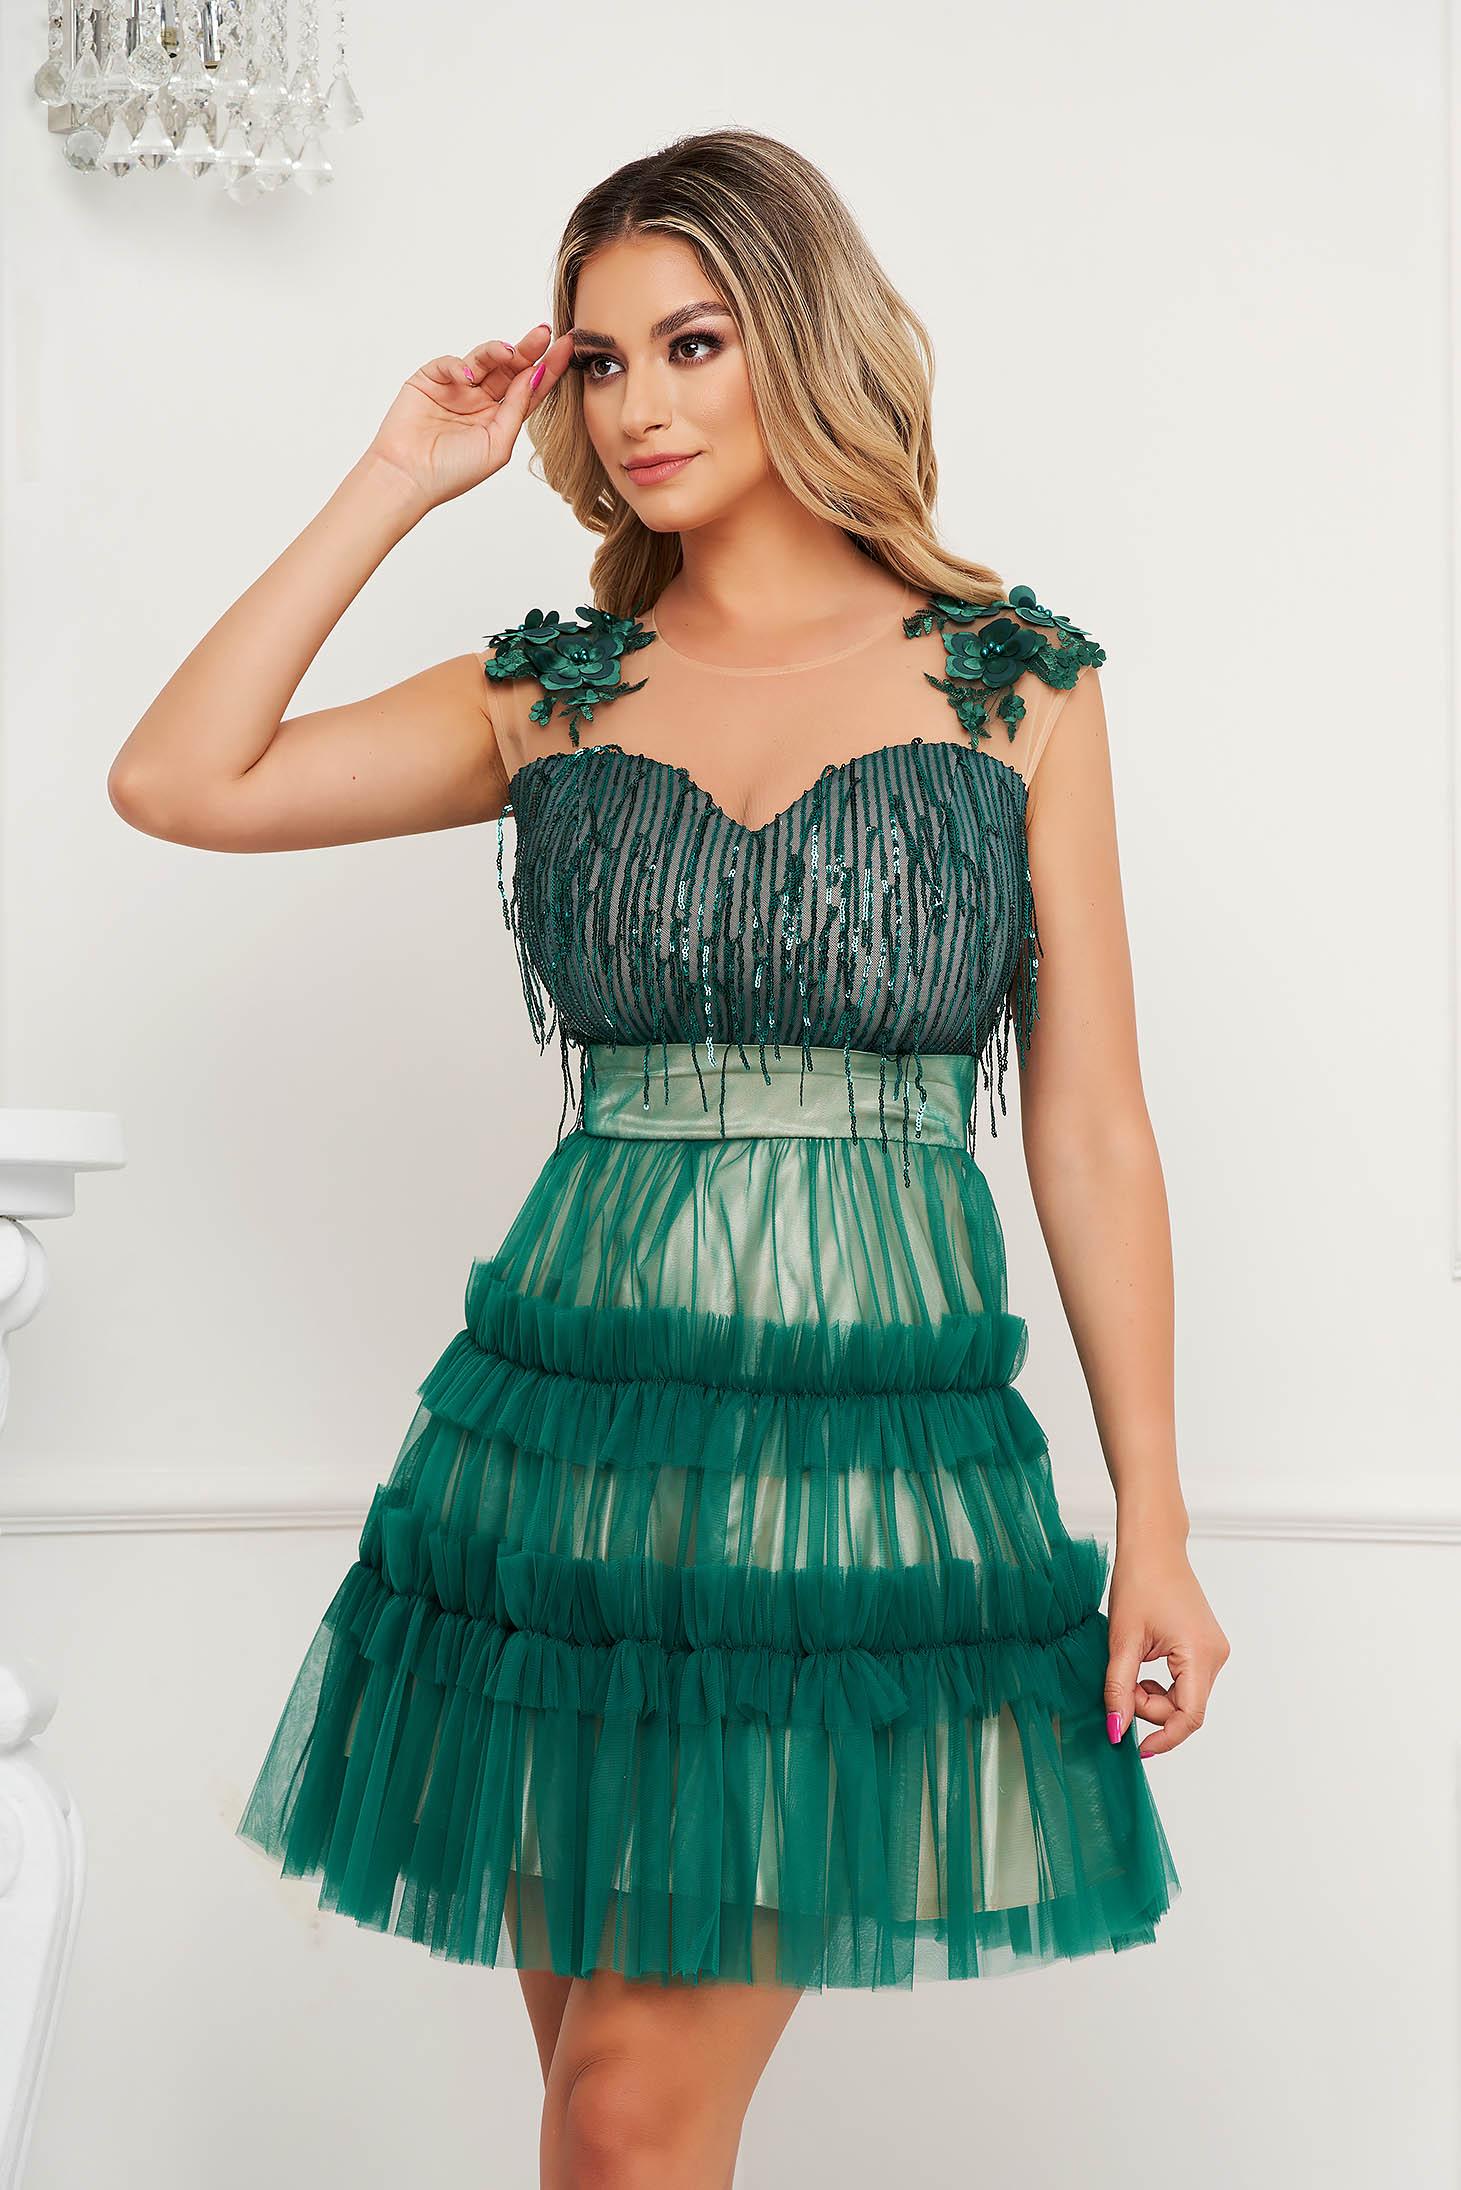 Rochie SunShine verde de ocazie cu croi in a cu aplicatii cu paiete tulle si broderie florala